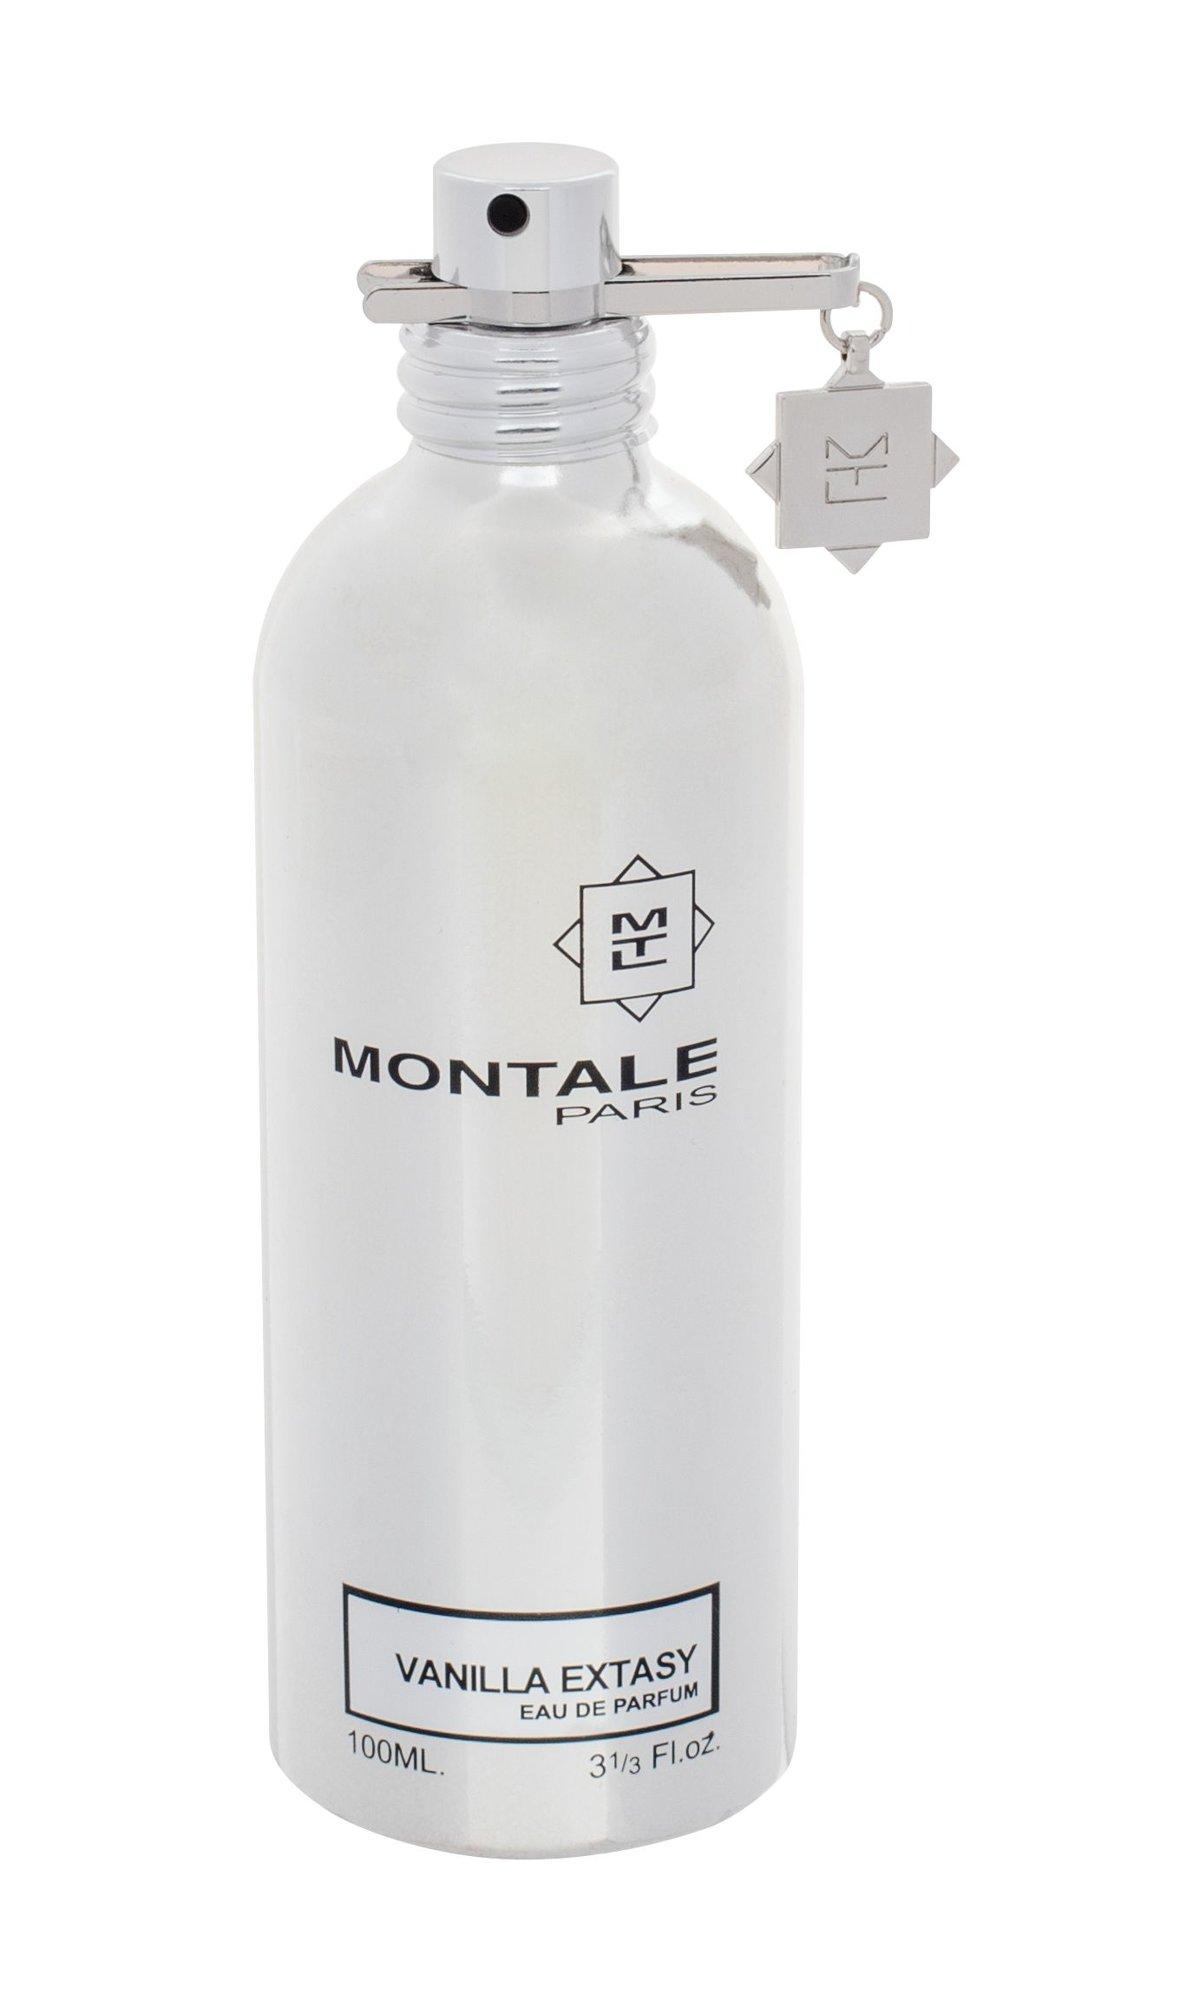 Montale Paris Vanilla Extasy EDP 100ml